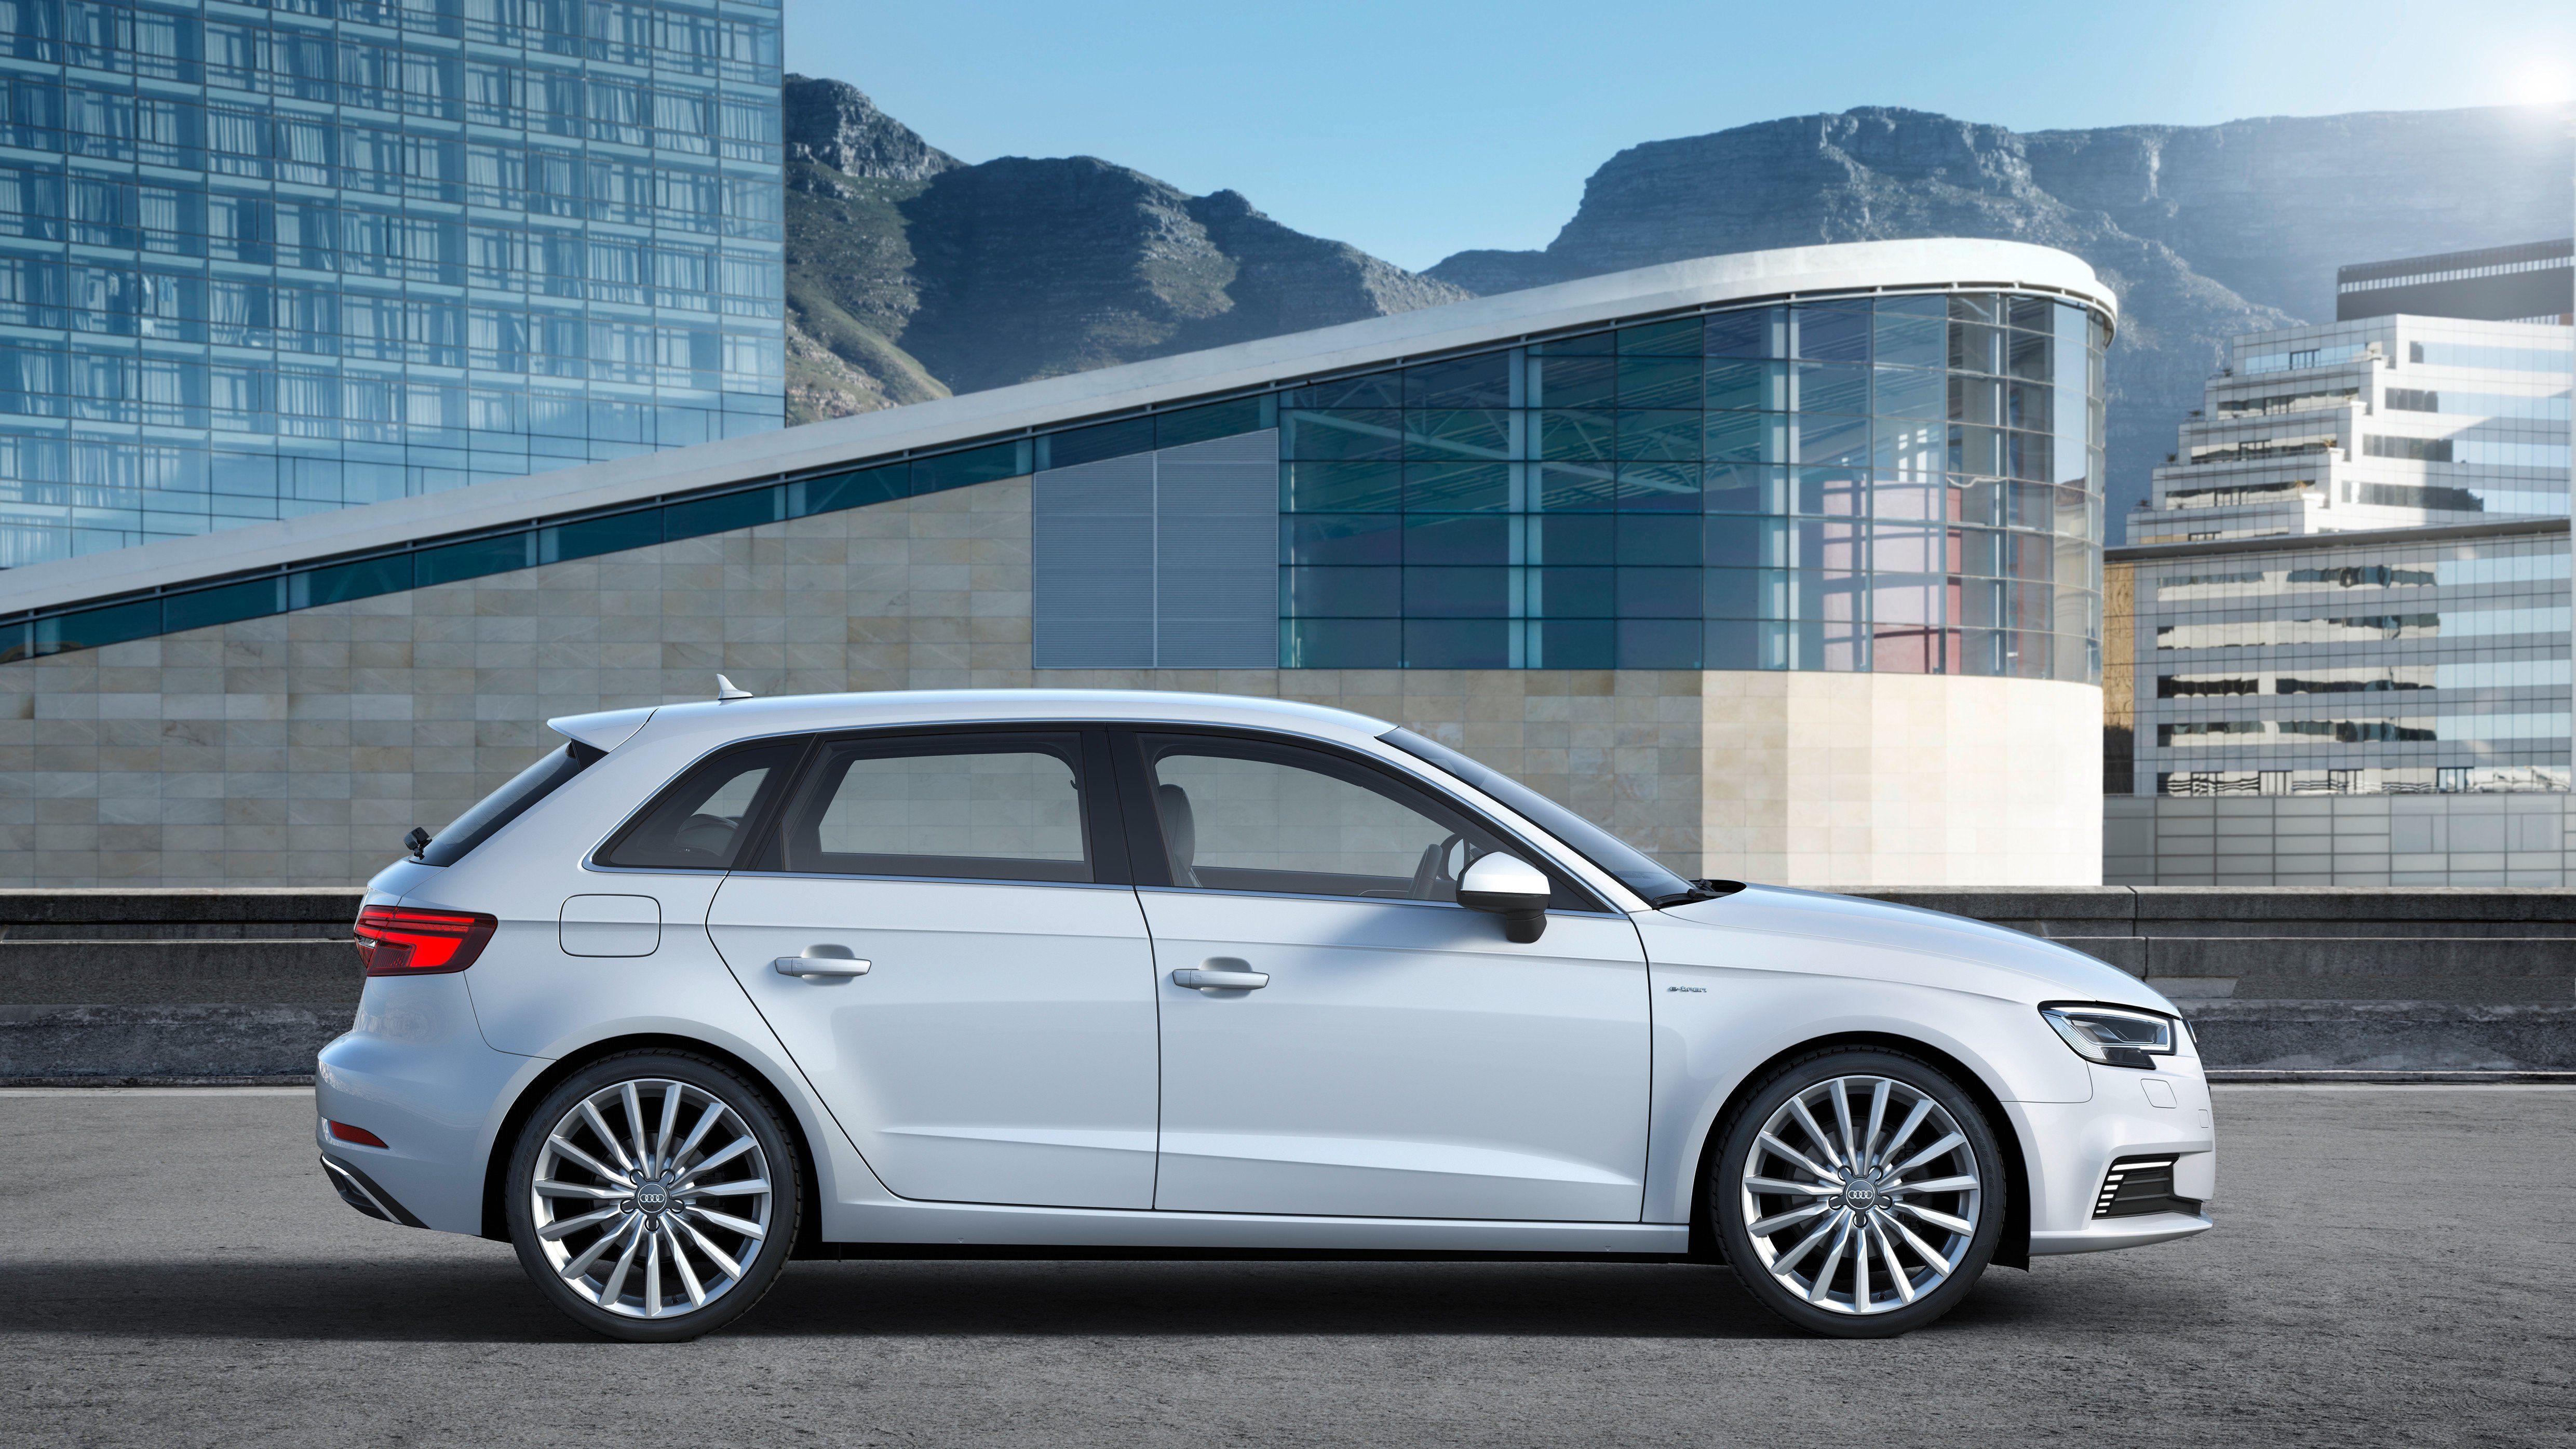 Motor N 2017 Audi A3 Sportback E Tron Delivers Even More Technology For A Audi A3 Sportback Audi A3 Audi